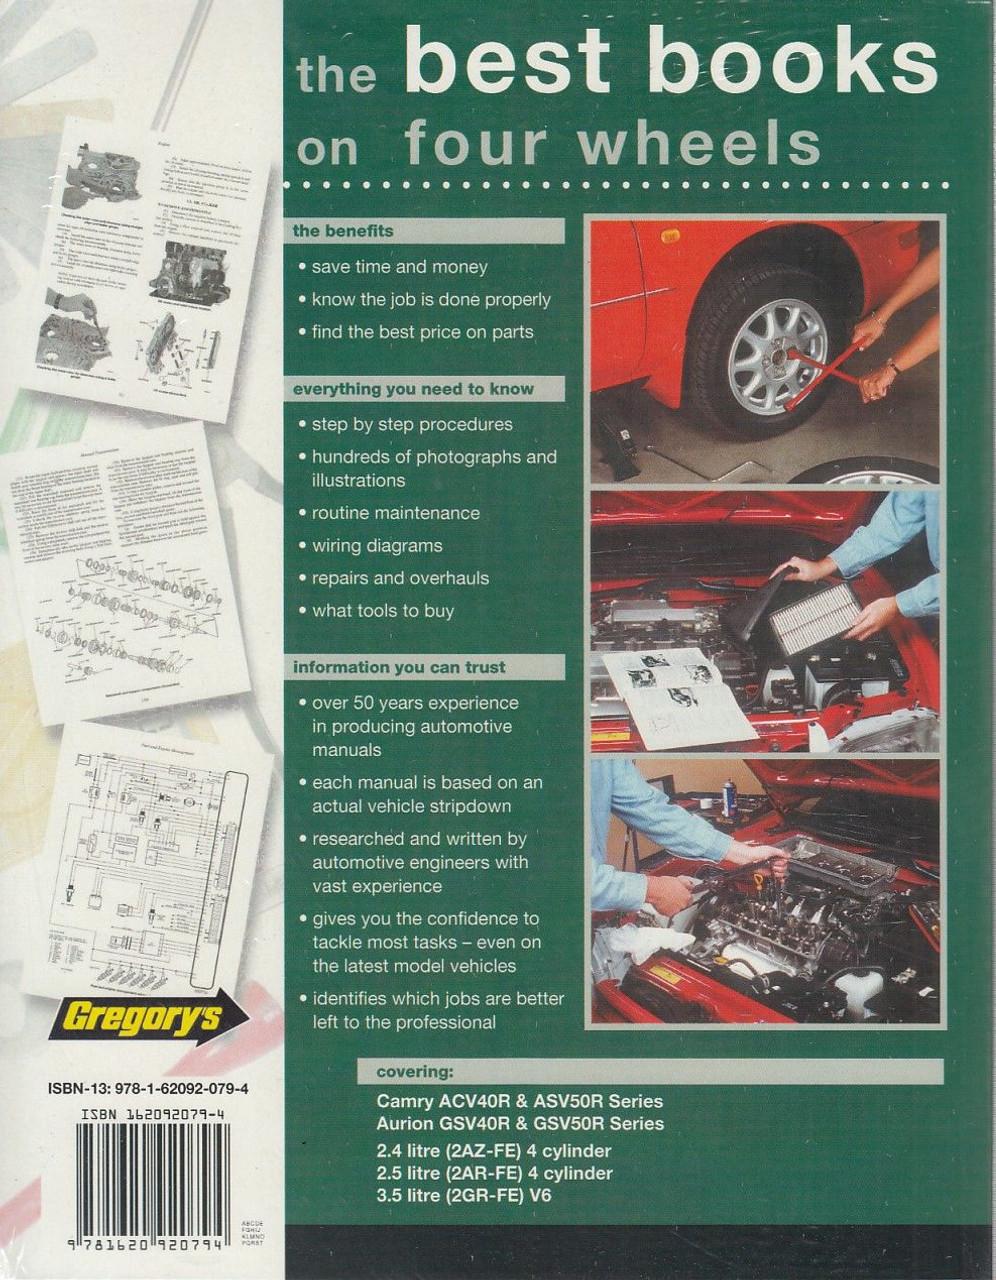 Toyota Aurion Wiring Diagram Manual Schematic Diagrams Electrical Australia Colour Code Camry 2 4 5 Litre 3 V6 2006 2013 Rh Automotobookshop Com Au Color